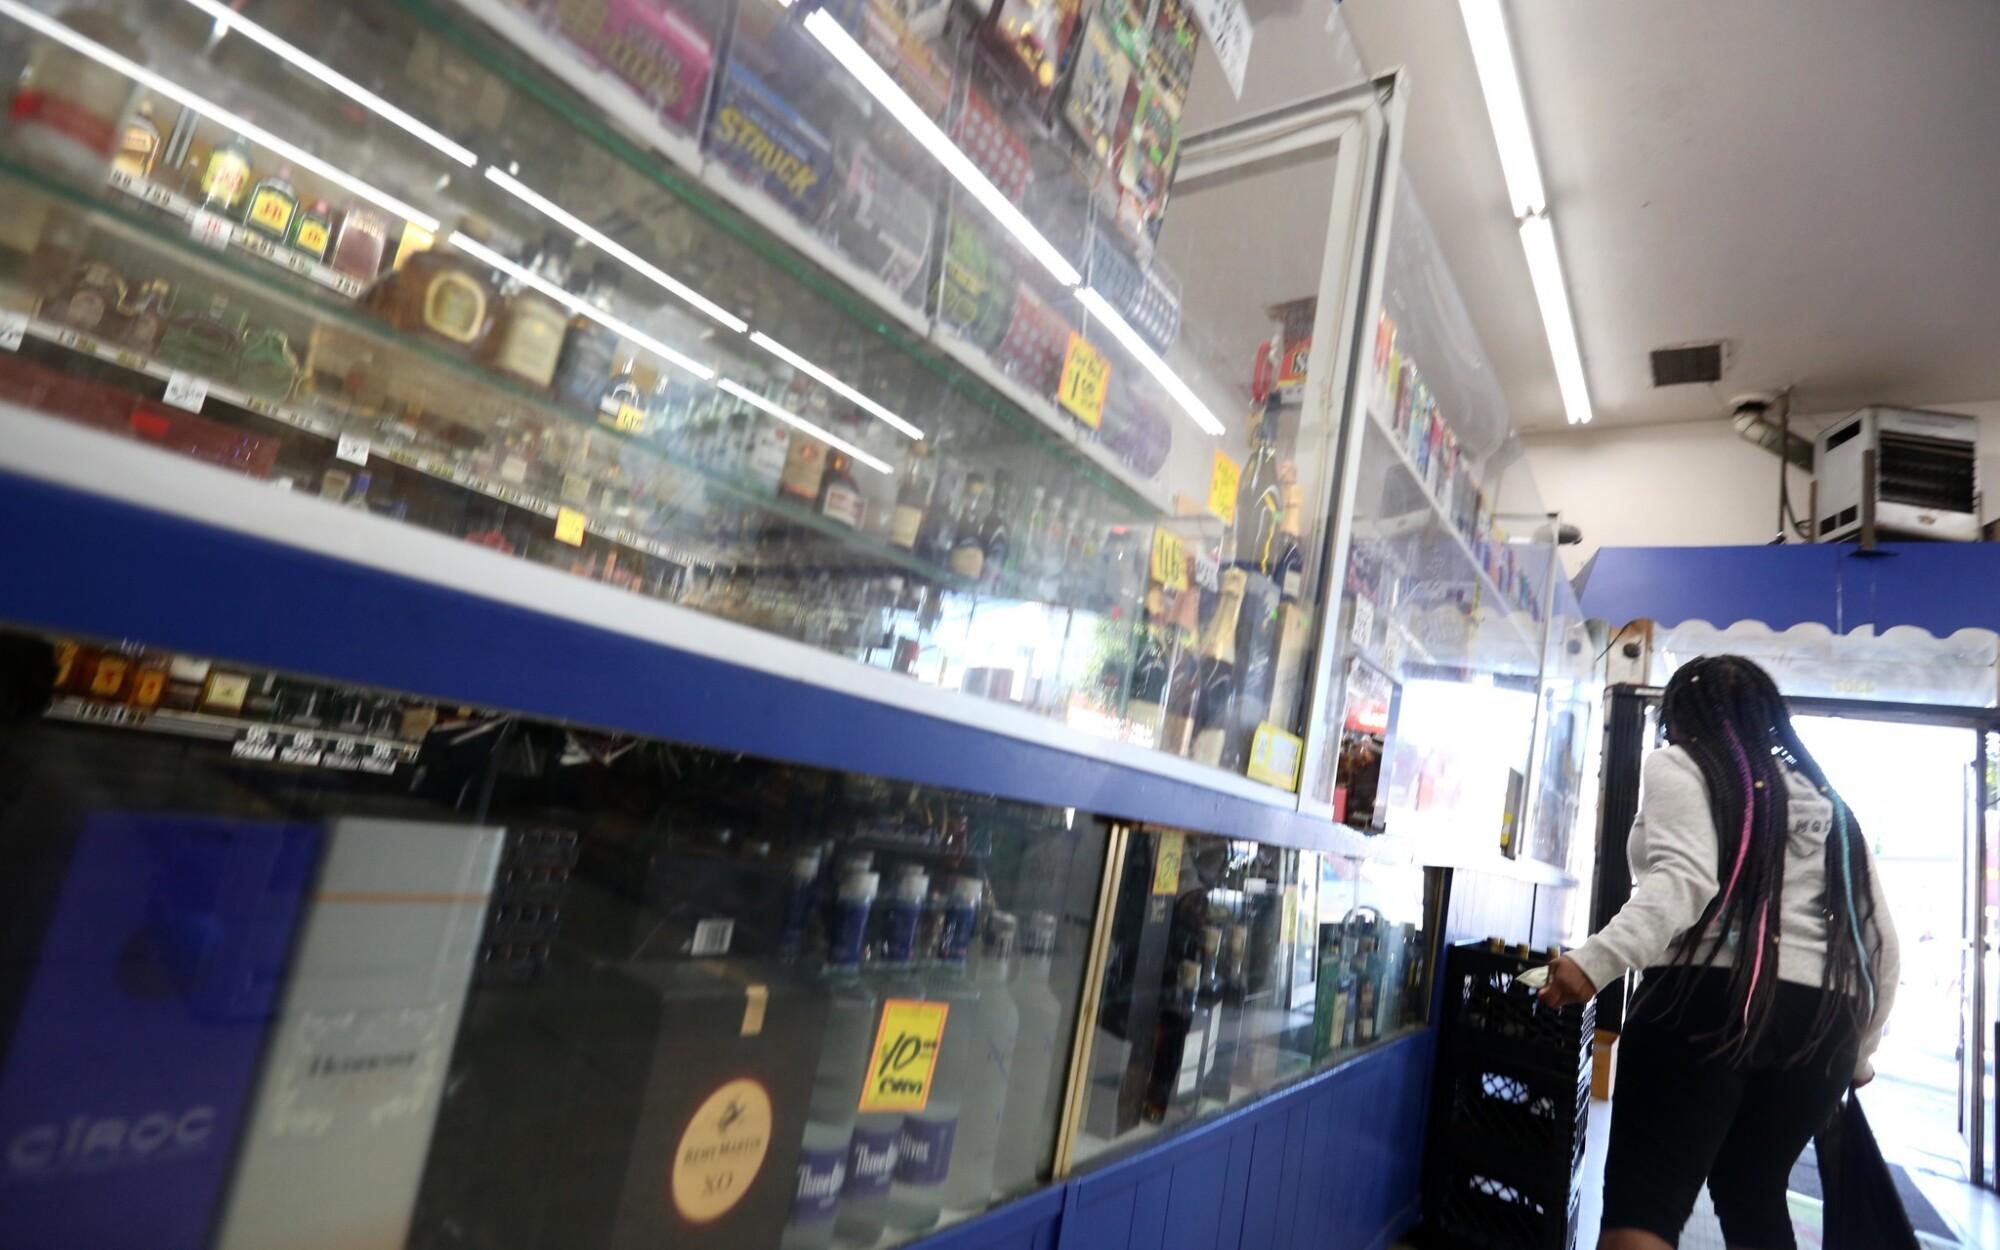 Korean liquor store. Black neighborhood. A quarter century after the riots, misgivings still run deep - Los Angeles Times